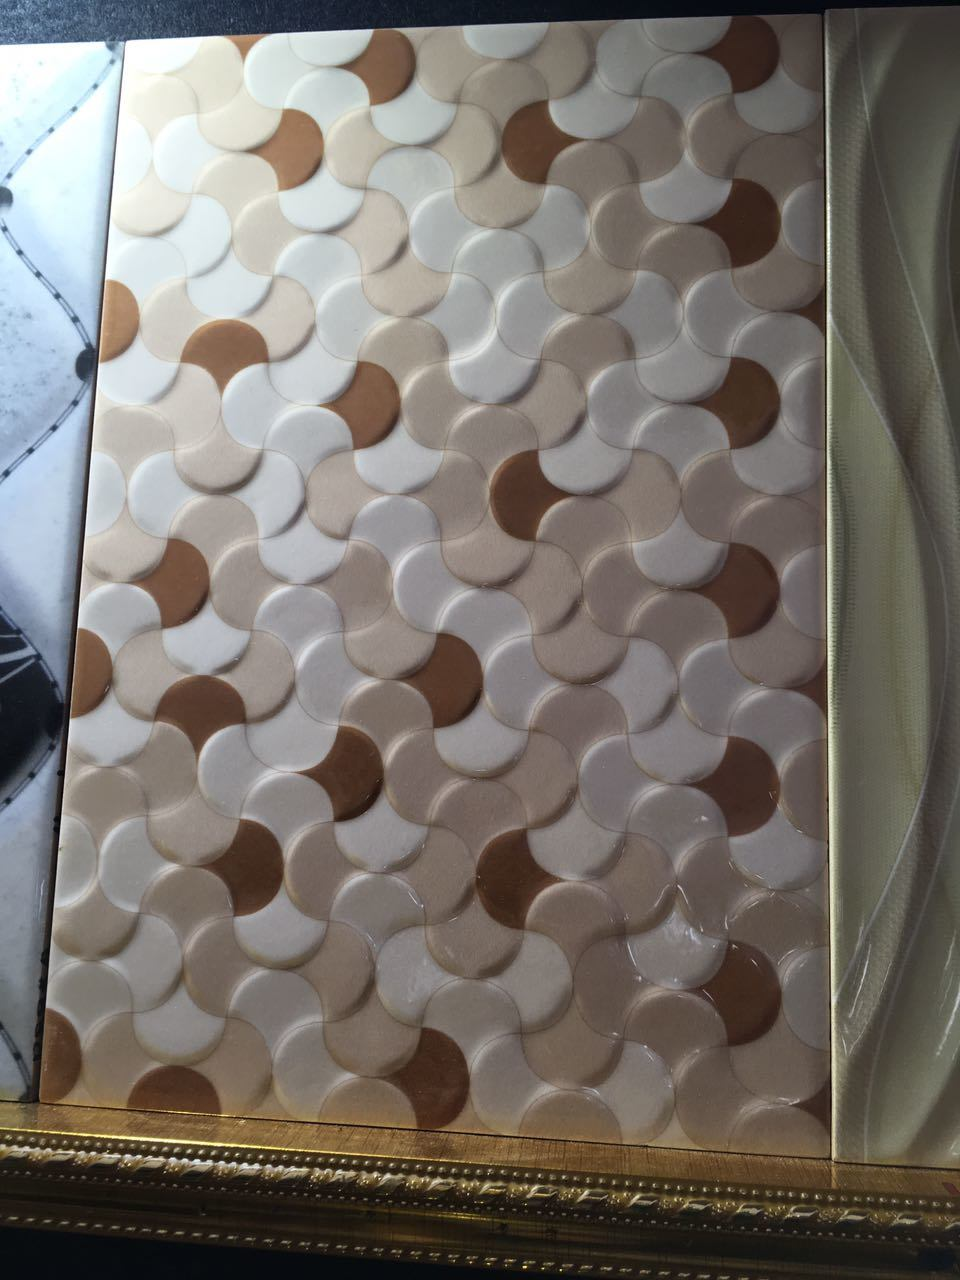 China waterproof ceramic inkjet wall tiles 200300mm thickness 63 china waterproof ceramic inkjet wall tiles 200300mm thickness 63mm china building material ceramic tile doublecrazyfo Choice Image